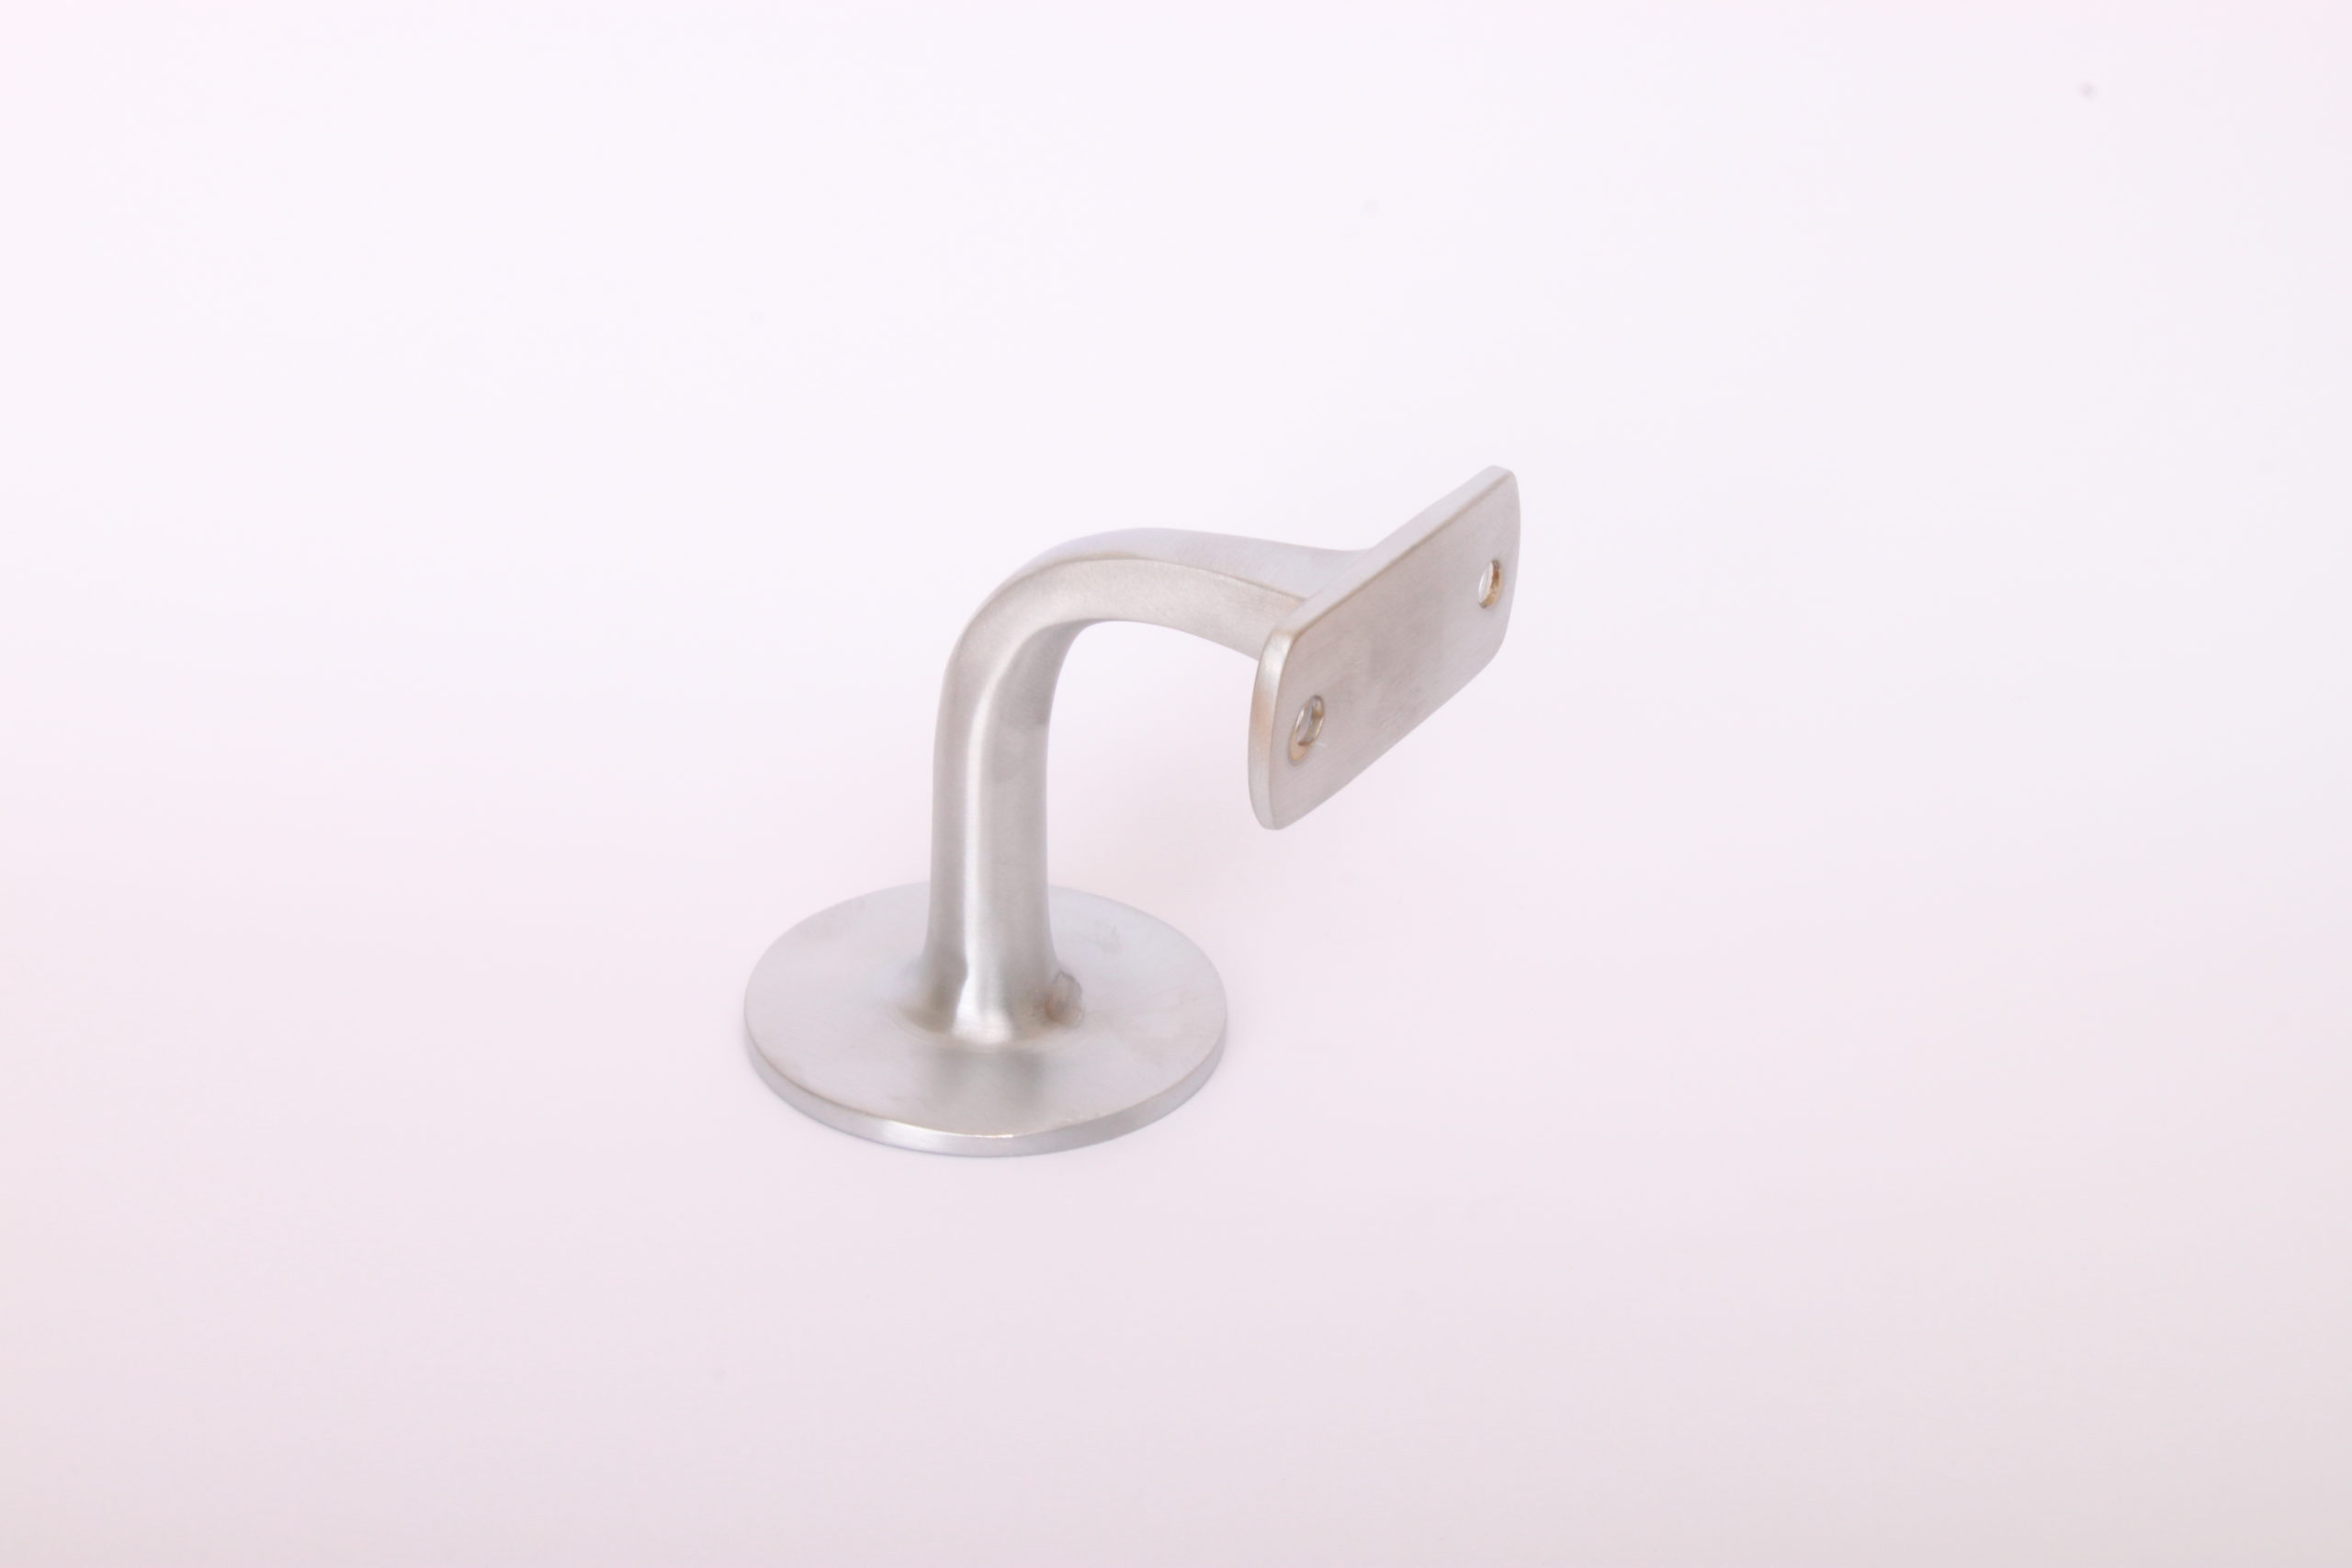 SC Handrail Bracket 5140SC by Top Flyte Systems